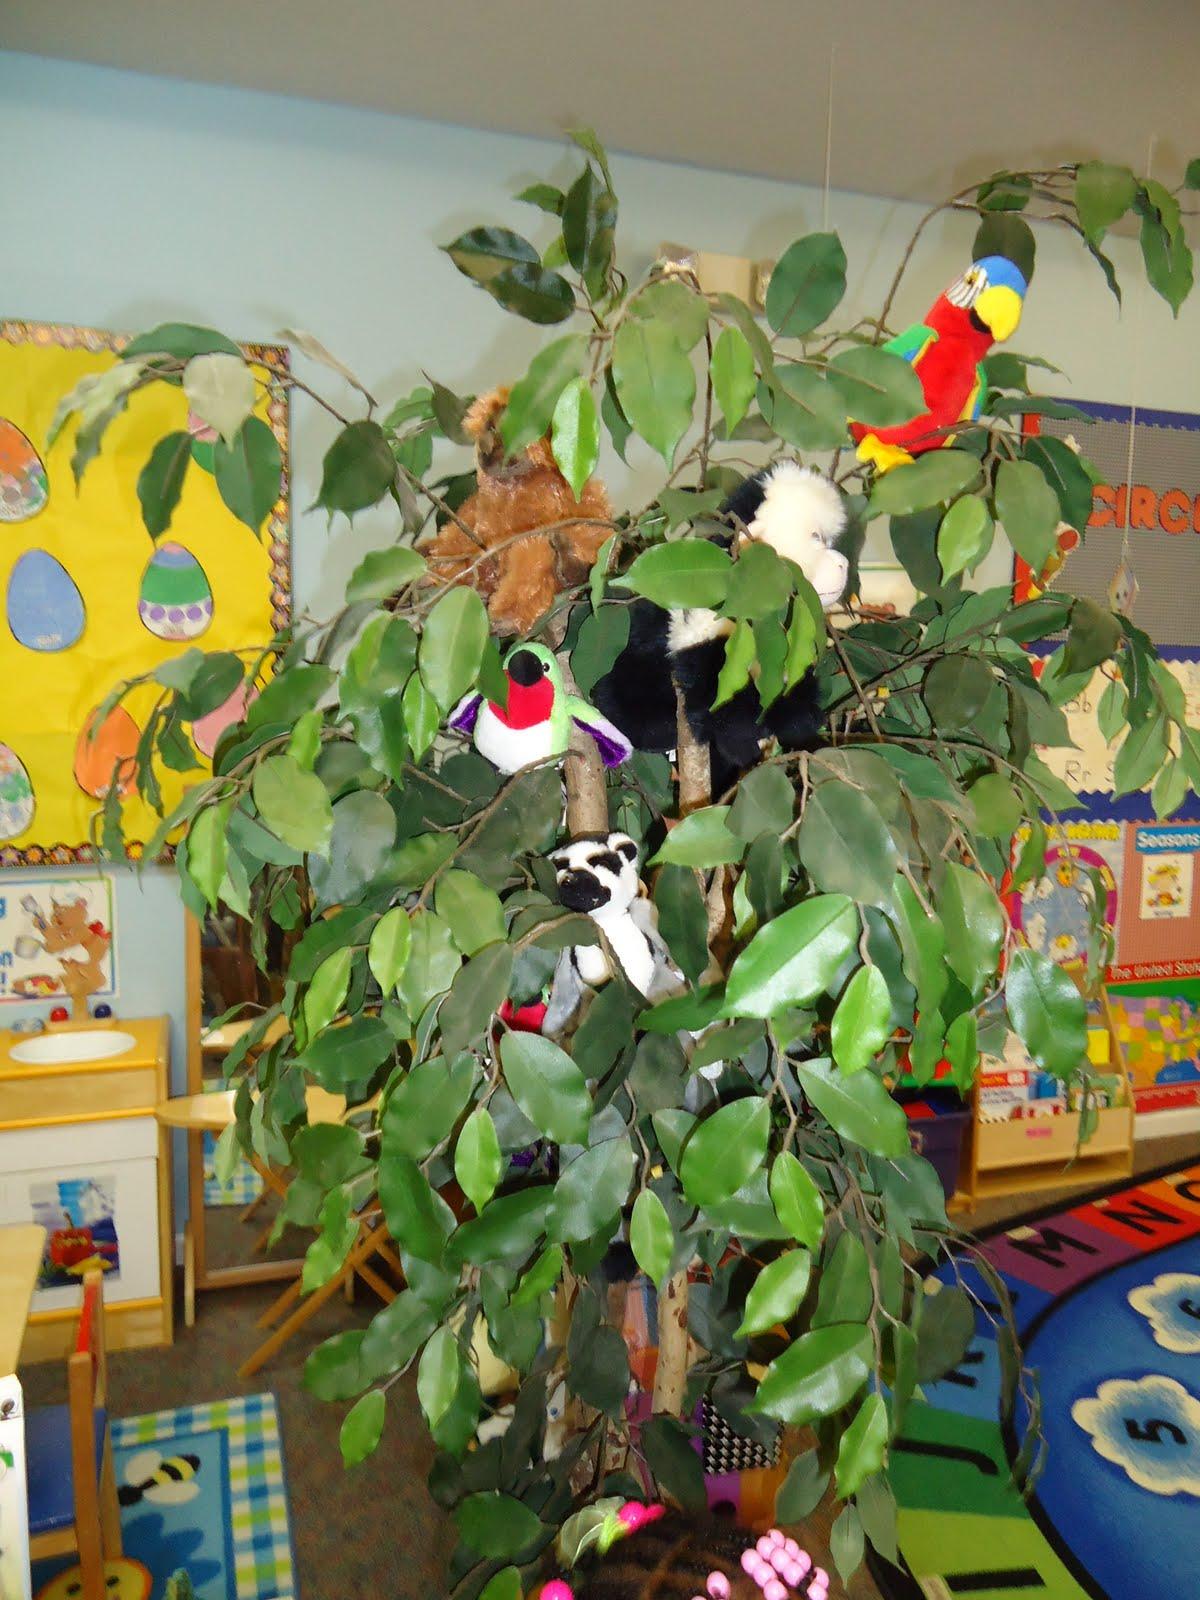 Rainforest Theme Classroom Ideas ~ Little illuminations creating a rainforest in the classroom